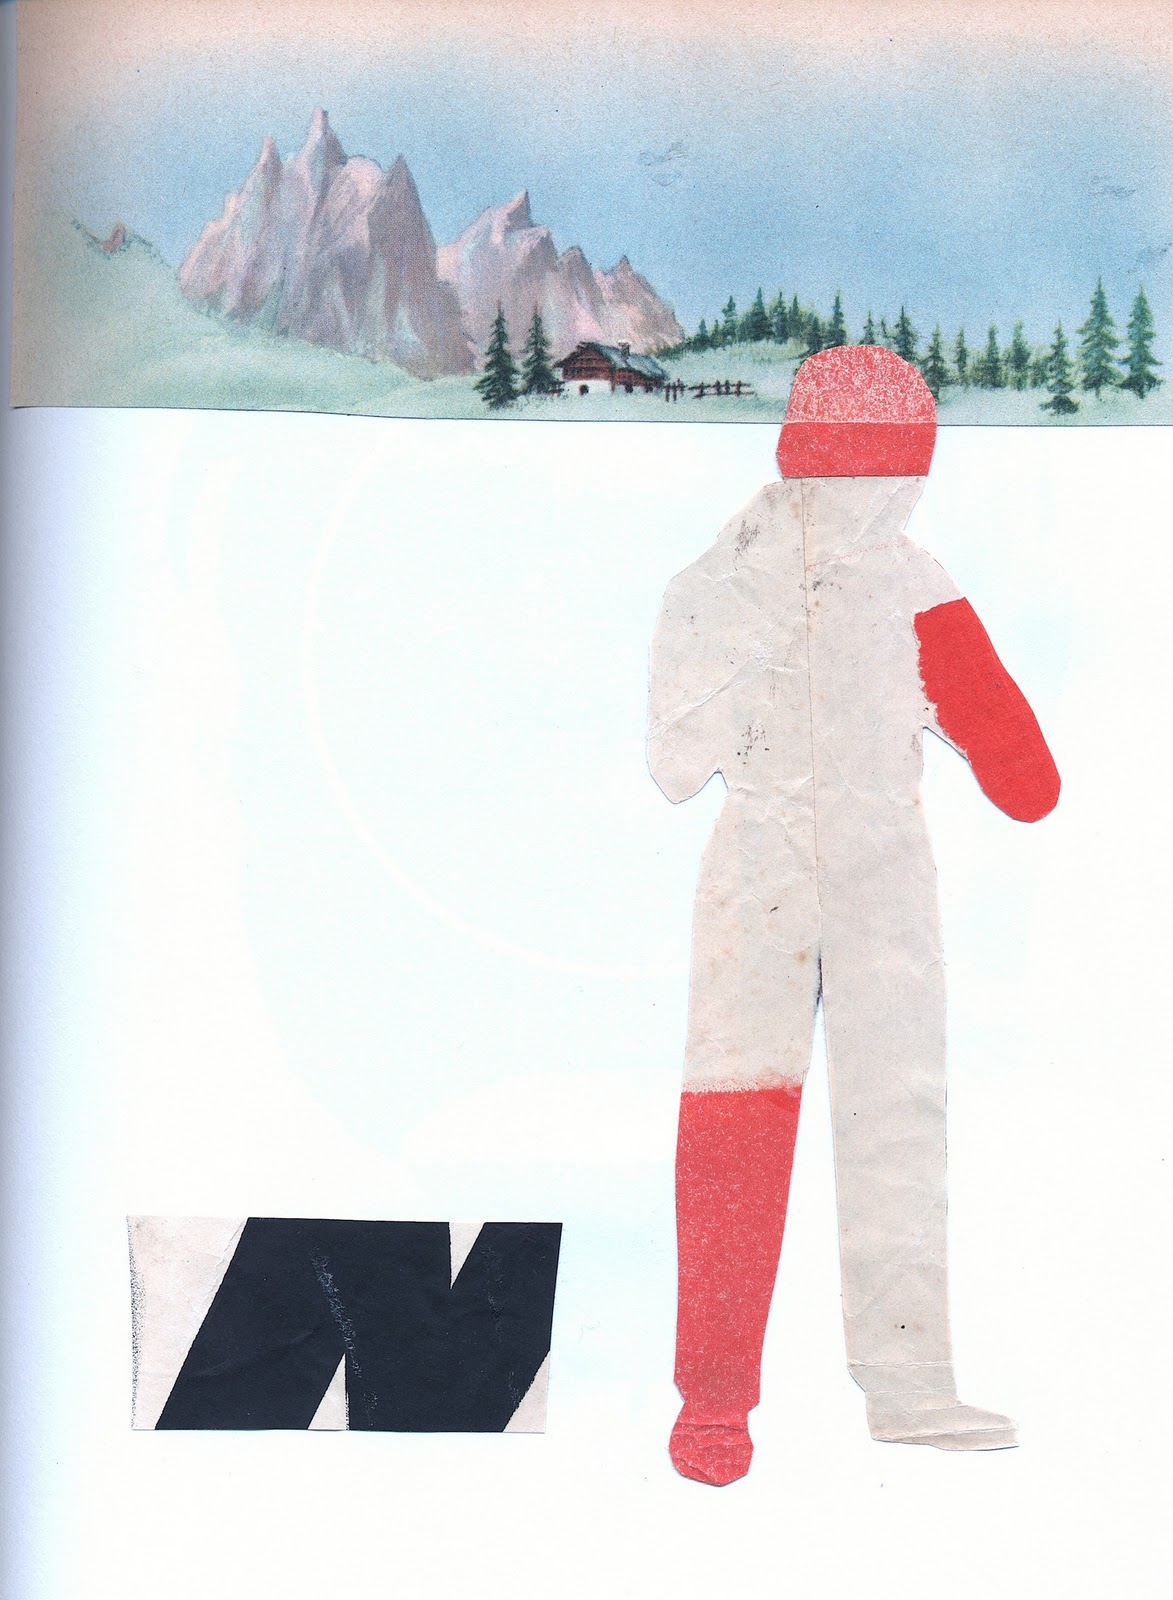 MATTHEW ROSE STUDIO: Gestalten's Cutting Edges: Contemporary Collage